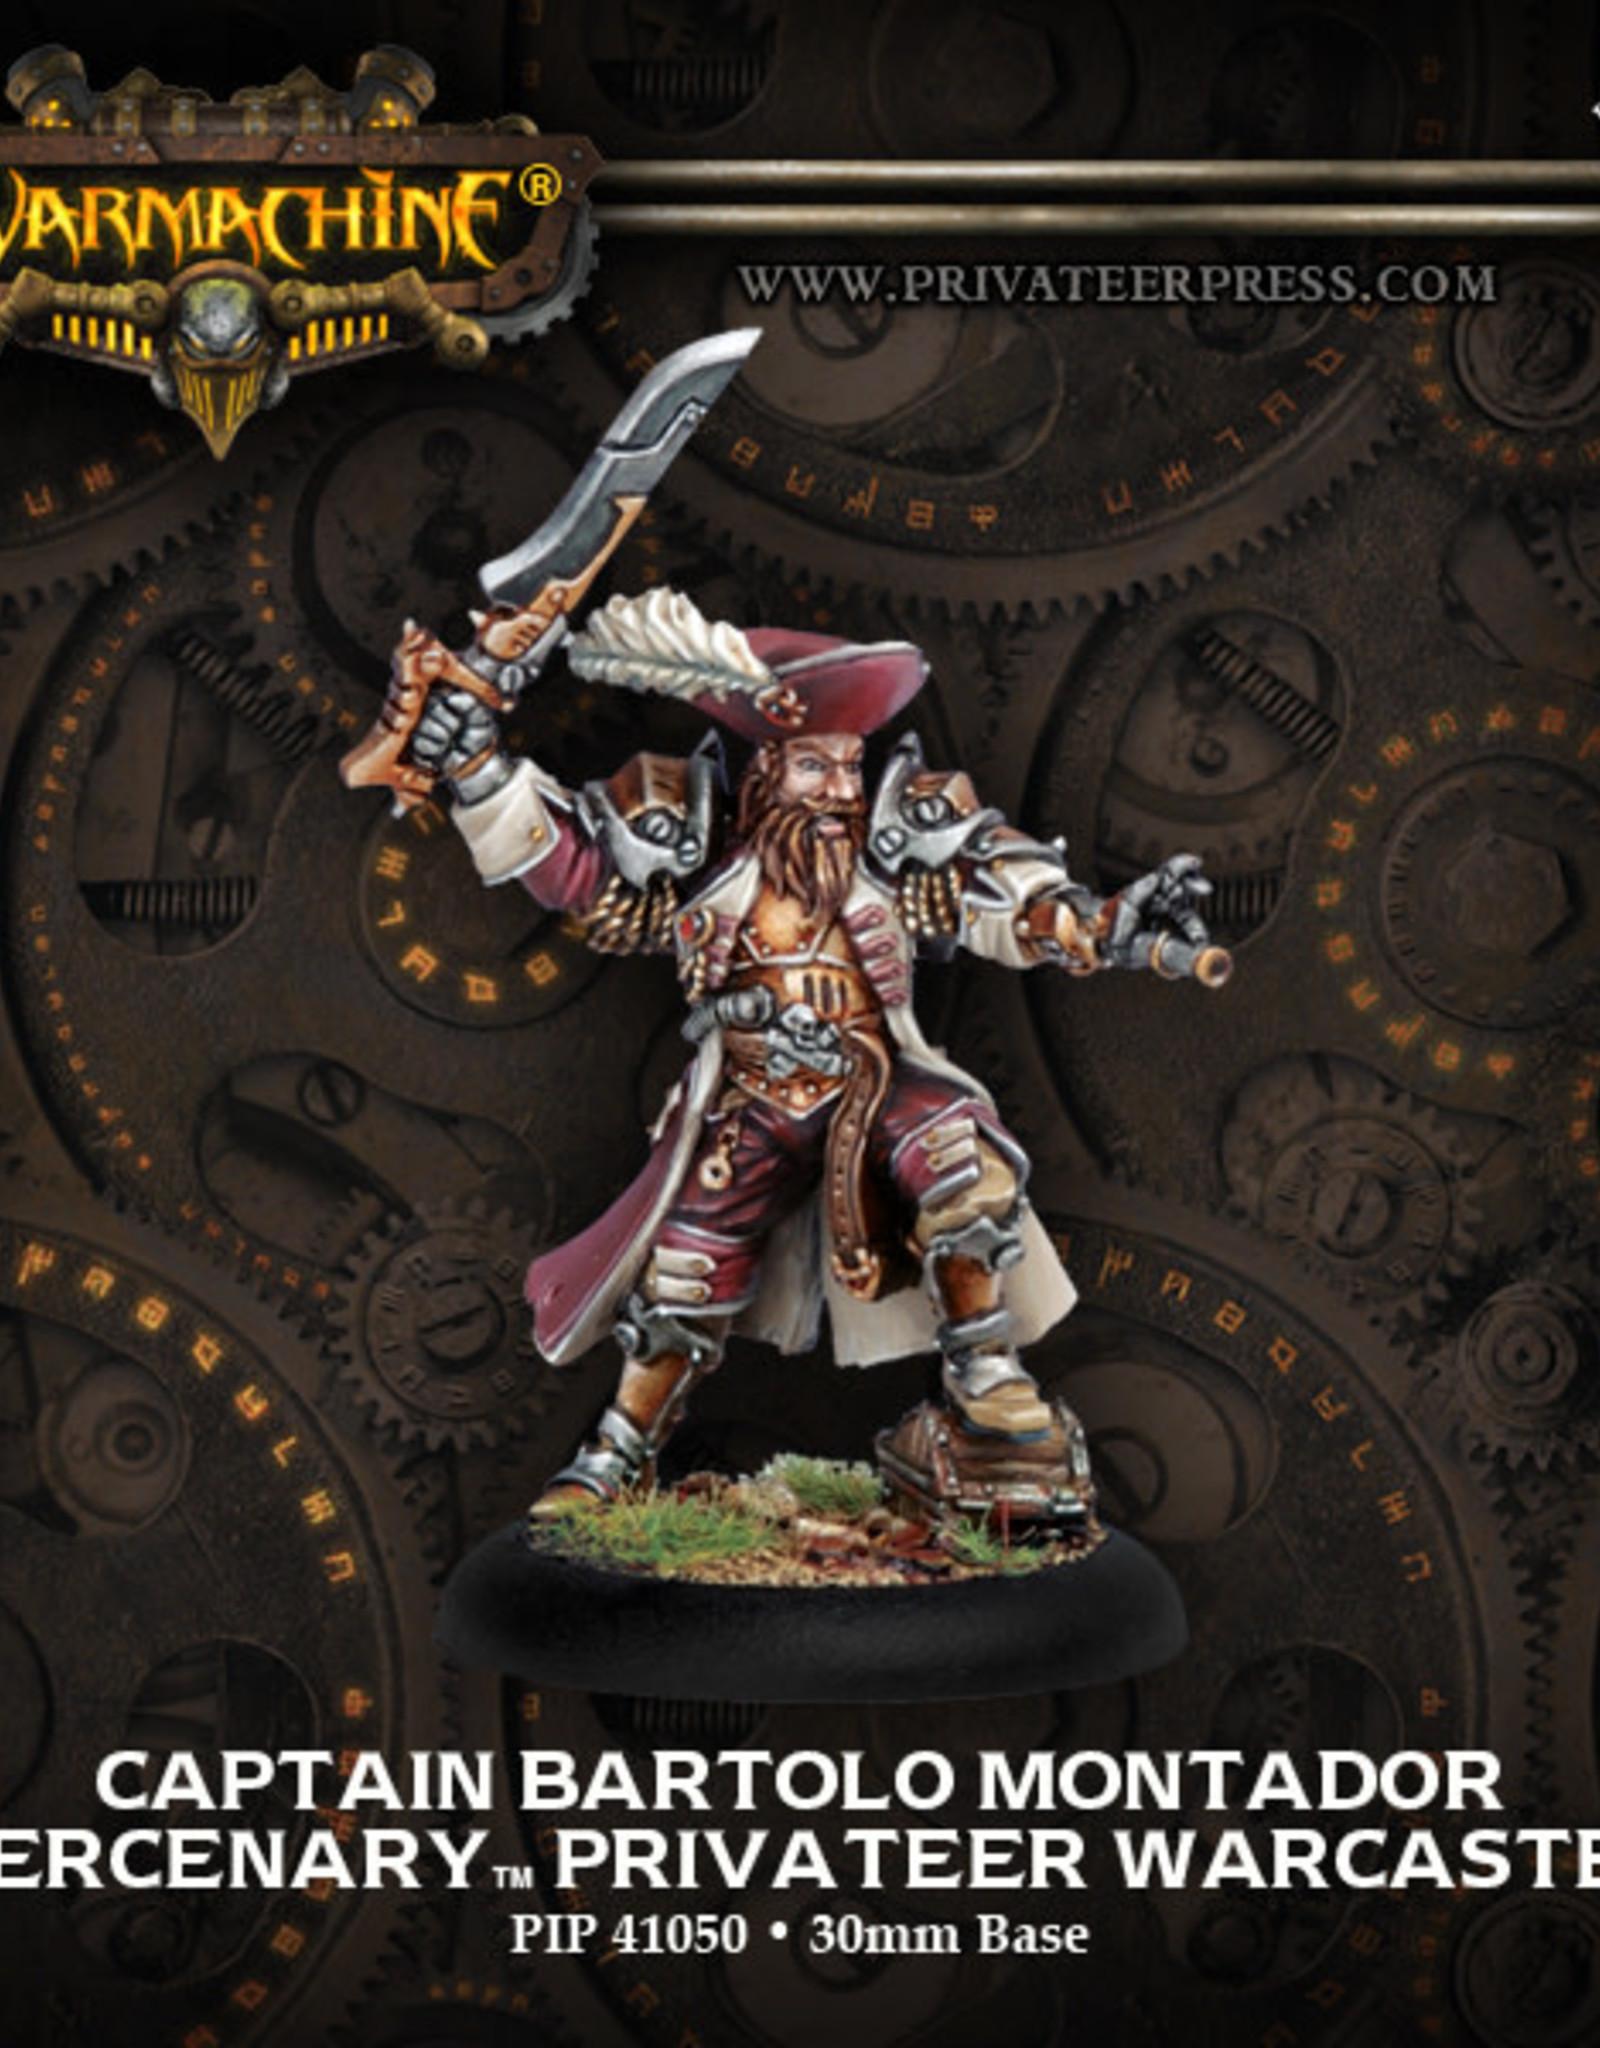 Warmachine Mercenaries - Captain Bartolo Montador